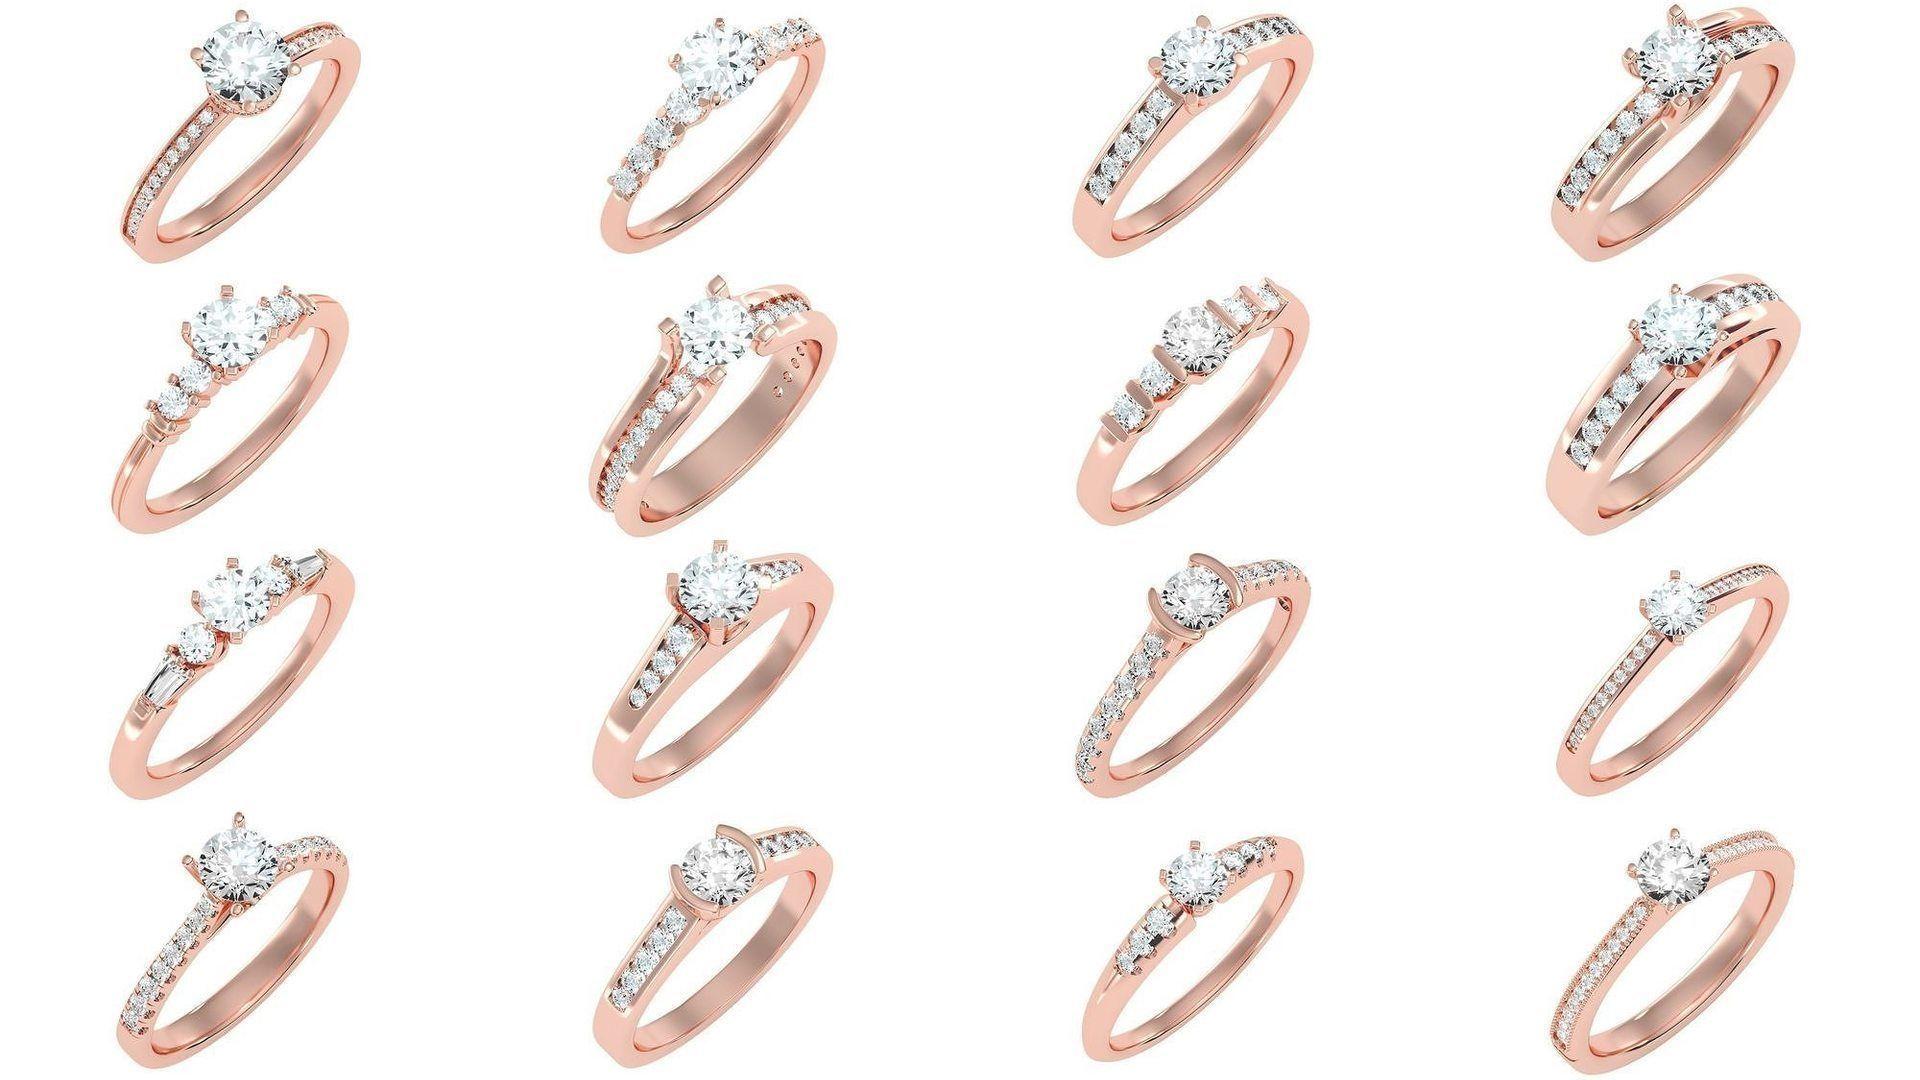 1000 solitaire wedding engagement women ring 3dm stl render